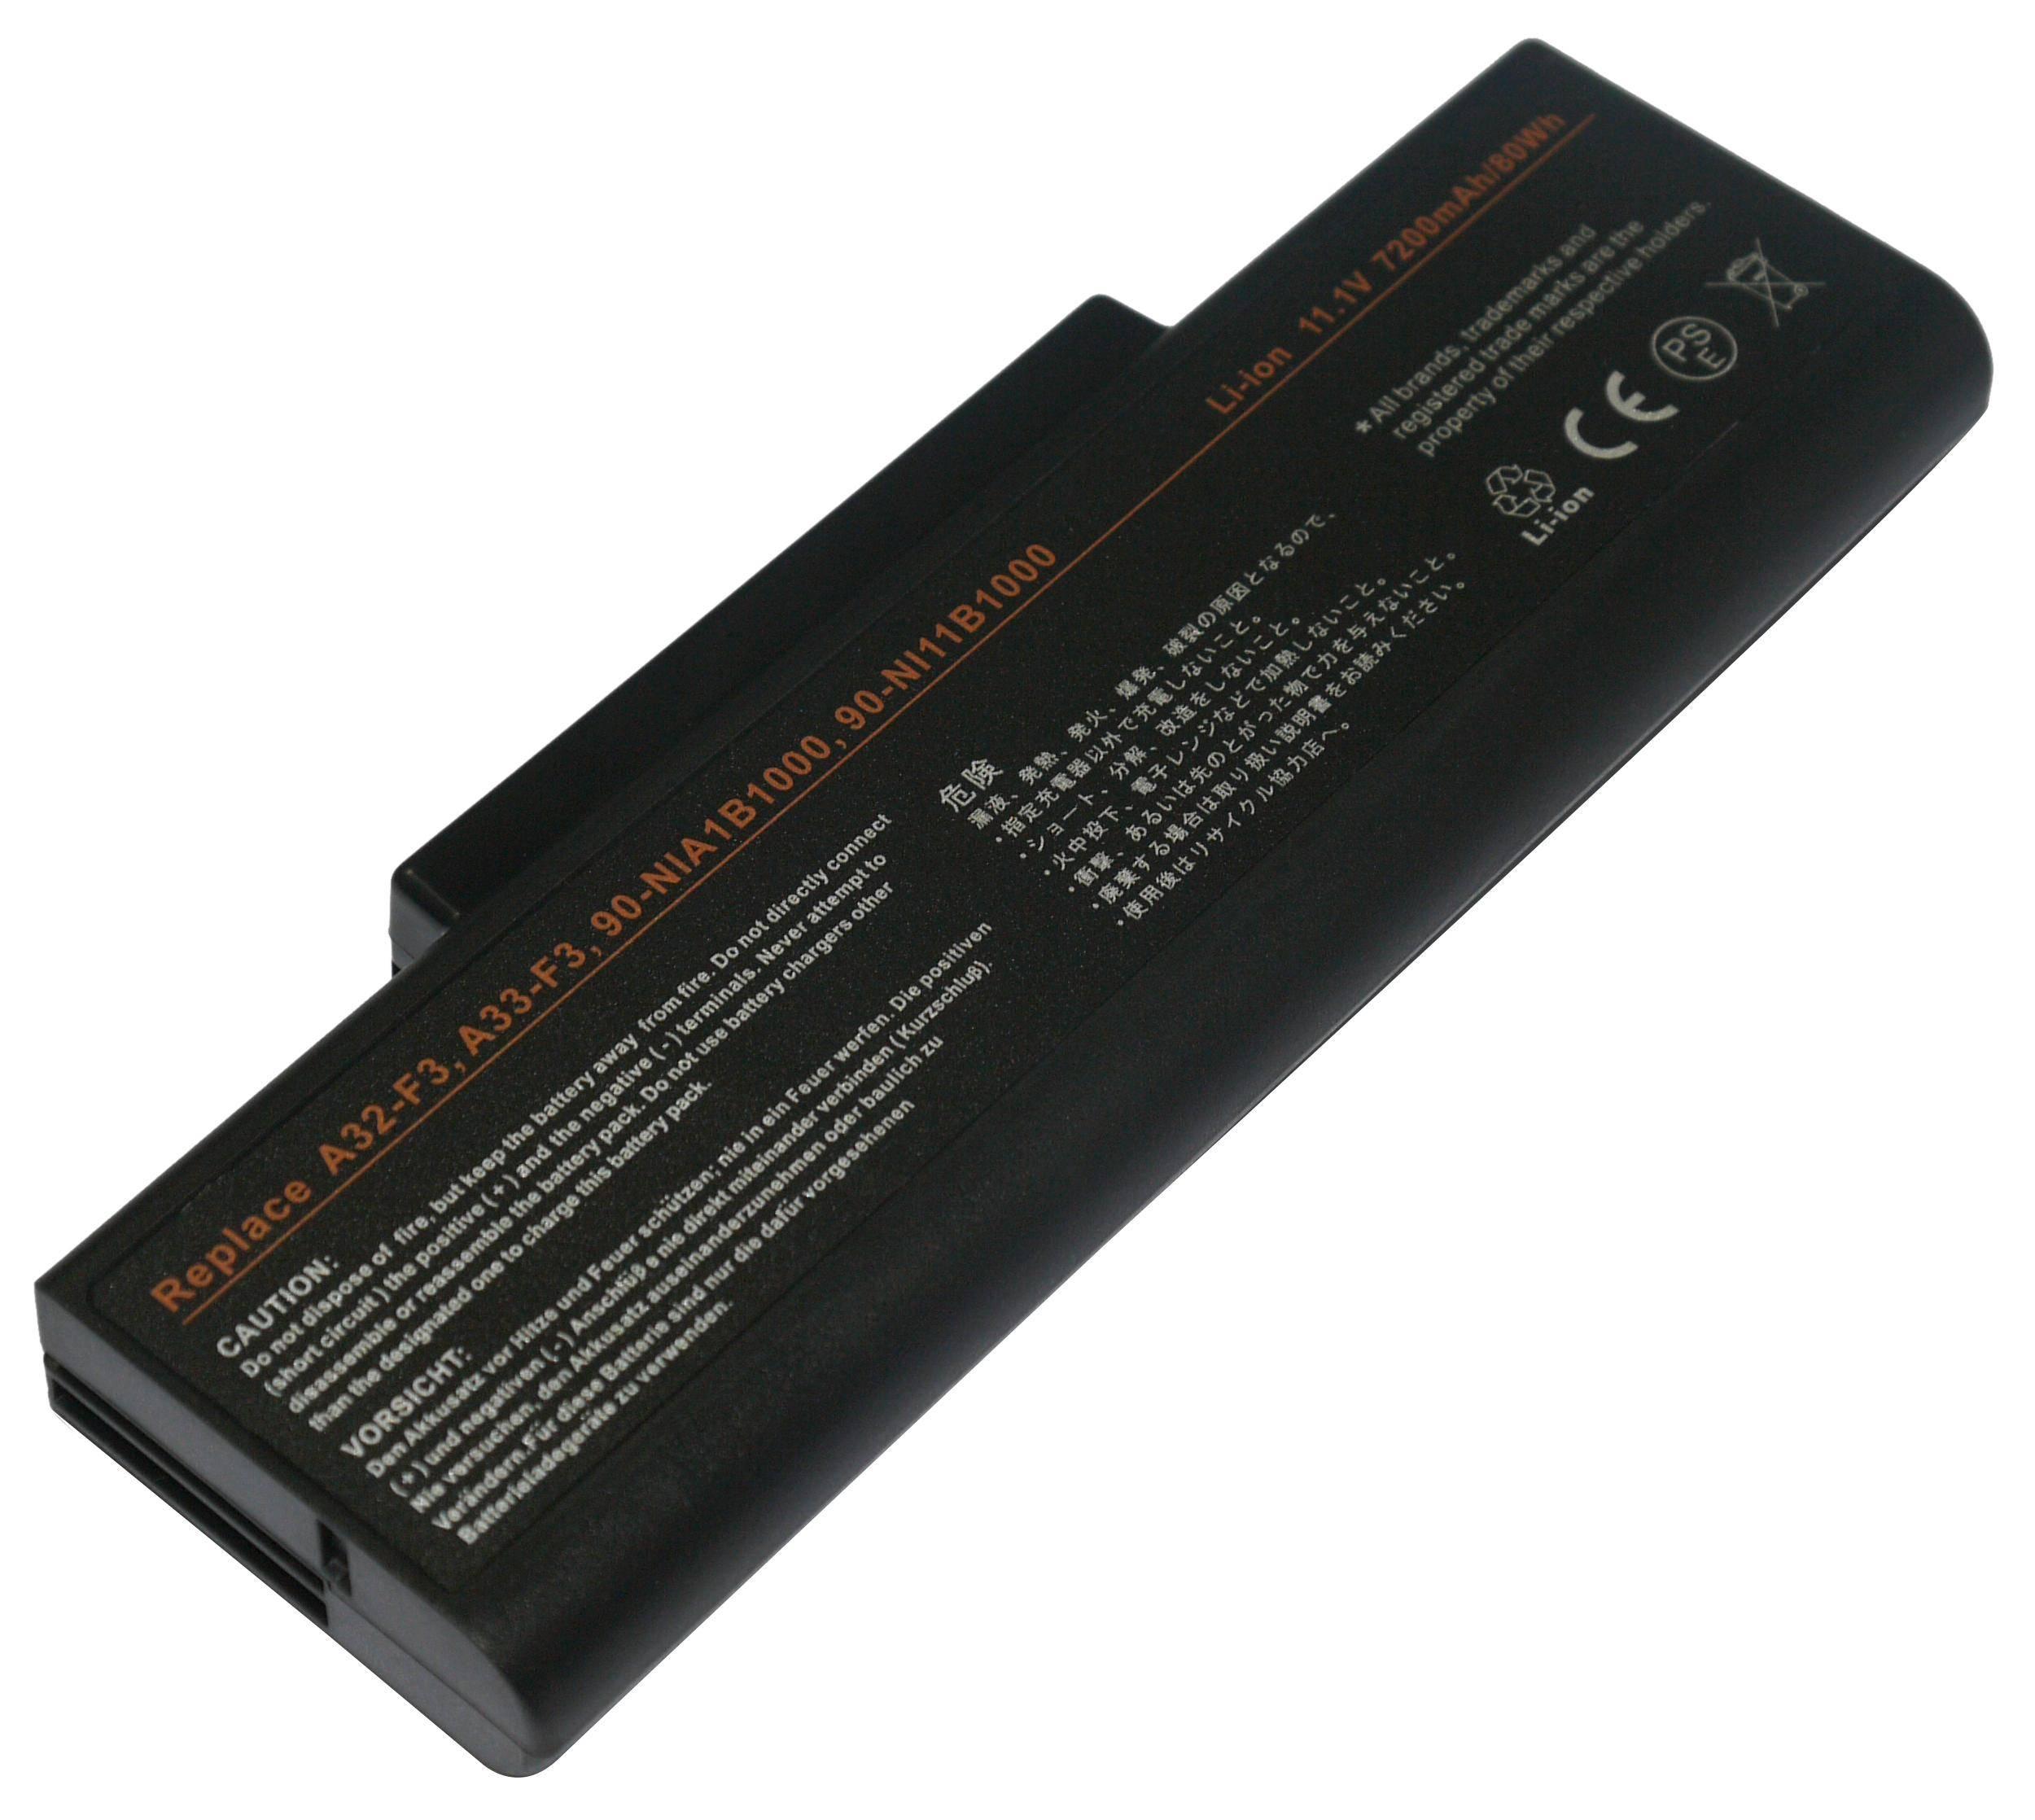 SNY Laptop Battery for ASUS F2F F2Hf F2J F2Je 11.1V